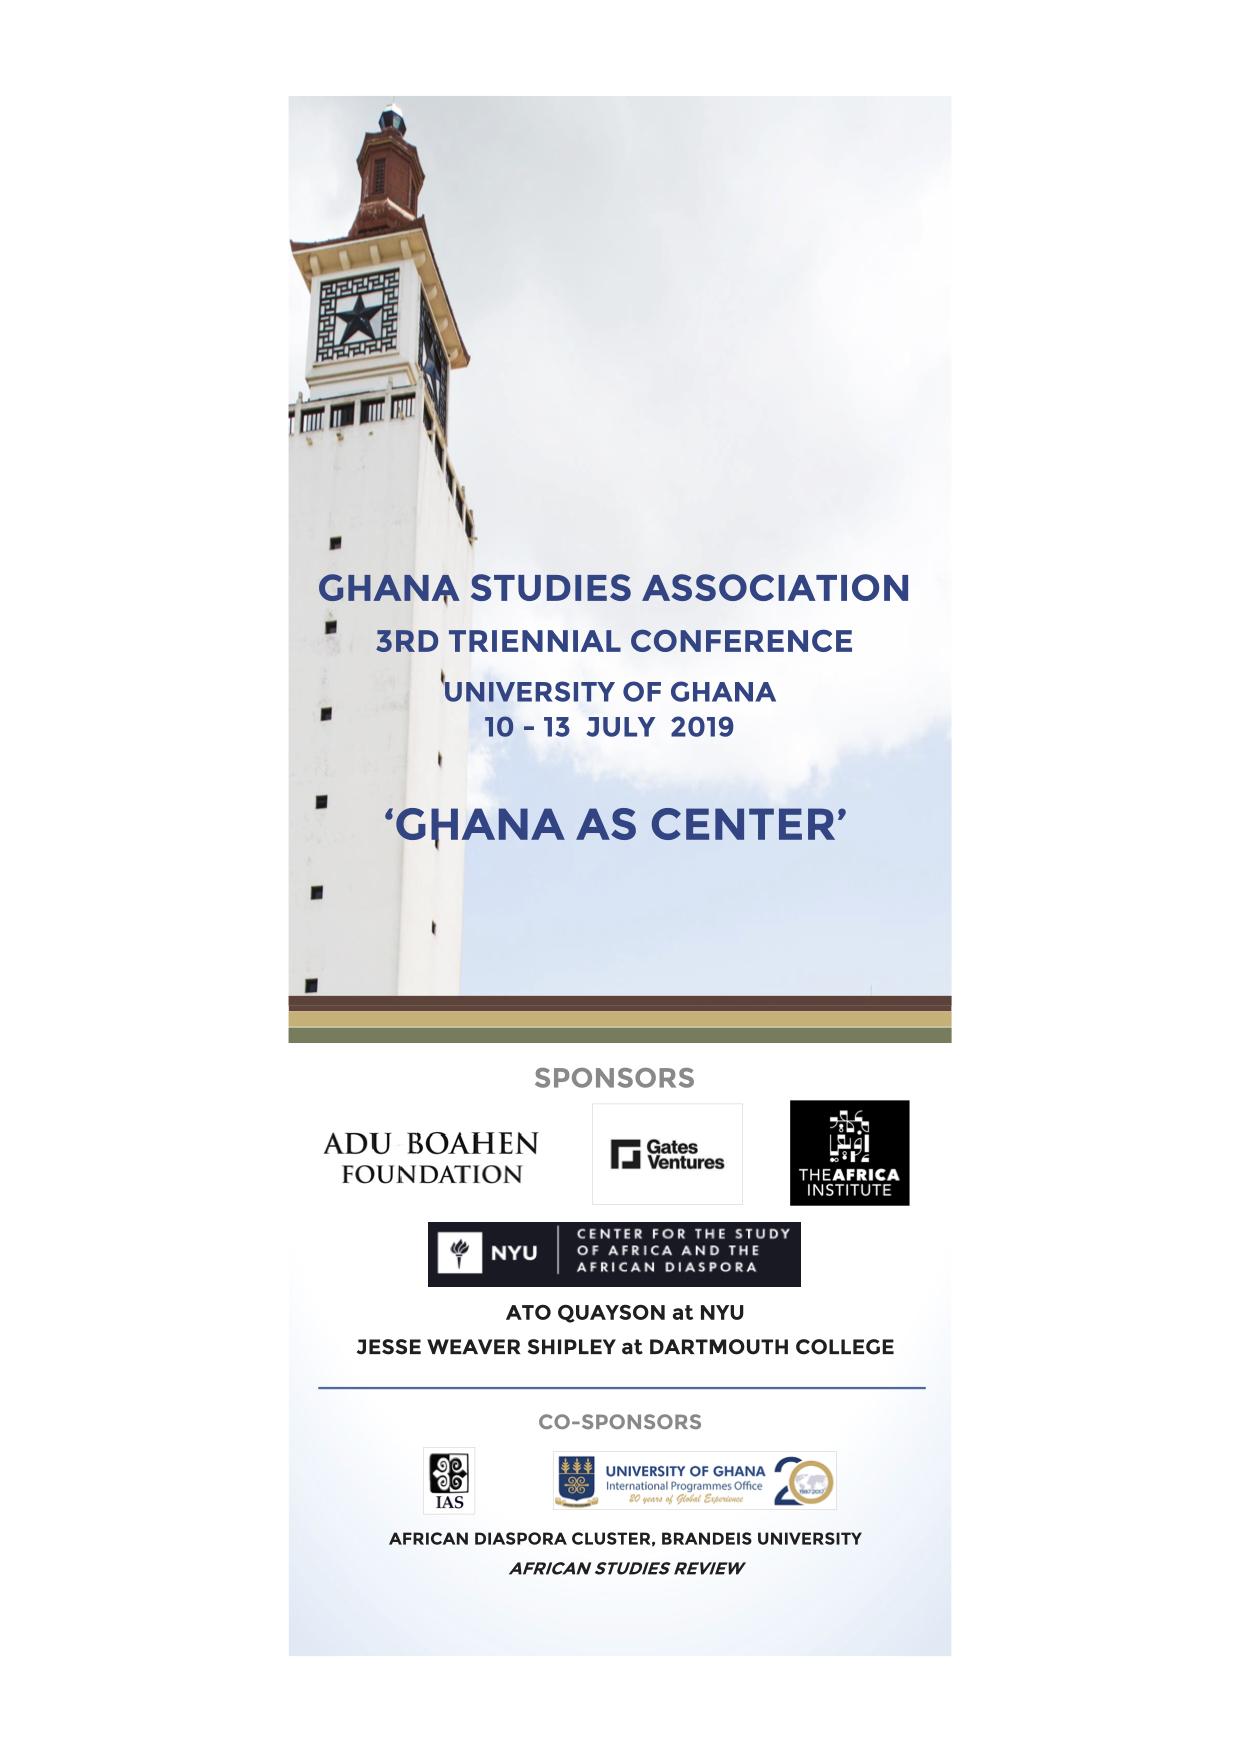 GSA Pull Up_sponsors logos only